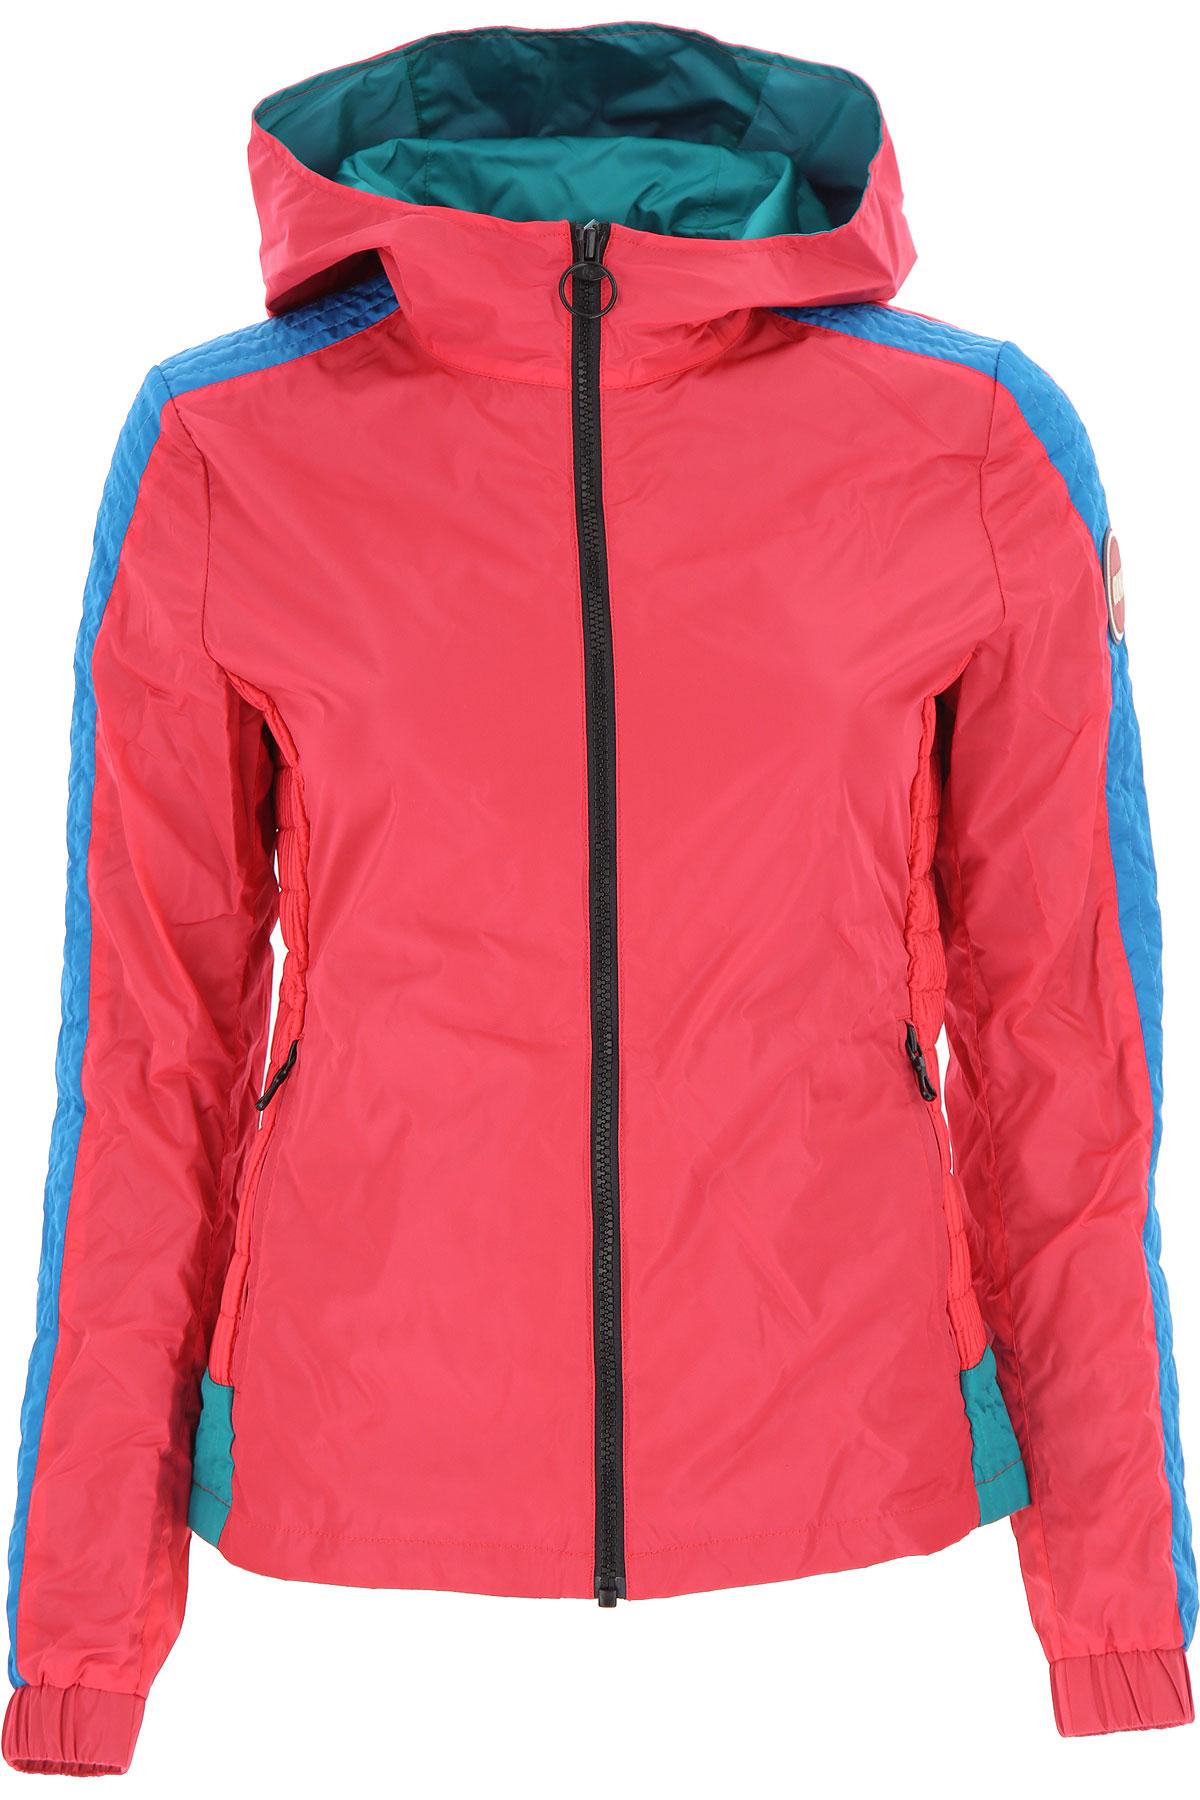 Colmar Jacket for Women On Sale, Magenta, polyester, 2019, 2 4 6